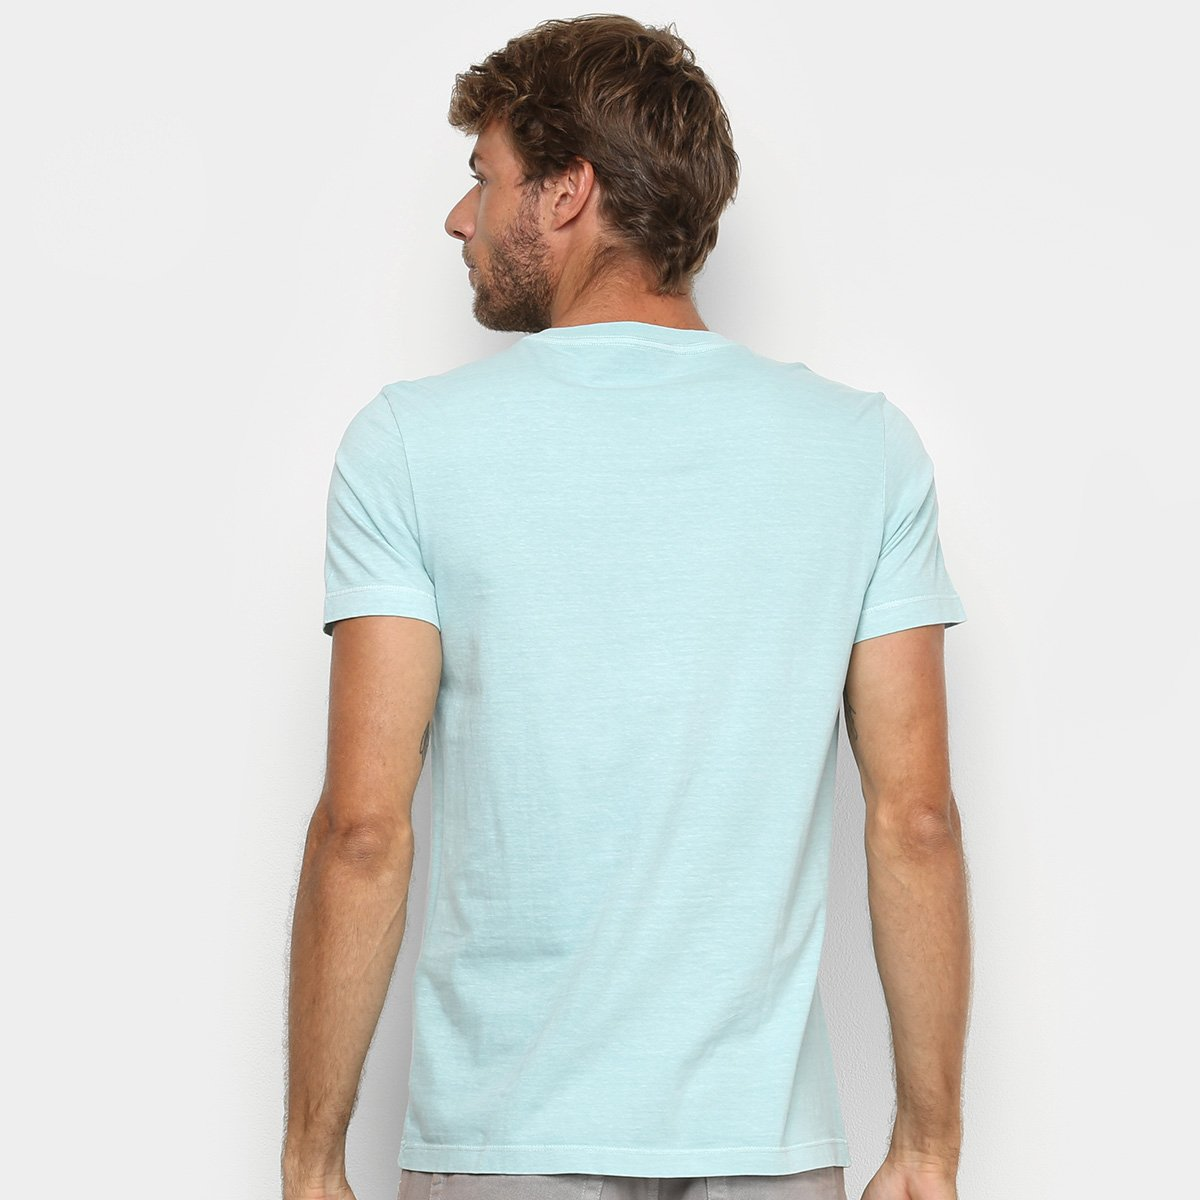 Camiseta Osklen Stone Vintage Surfing Masculina - Azul